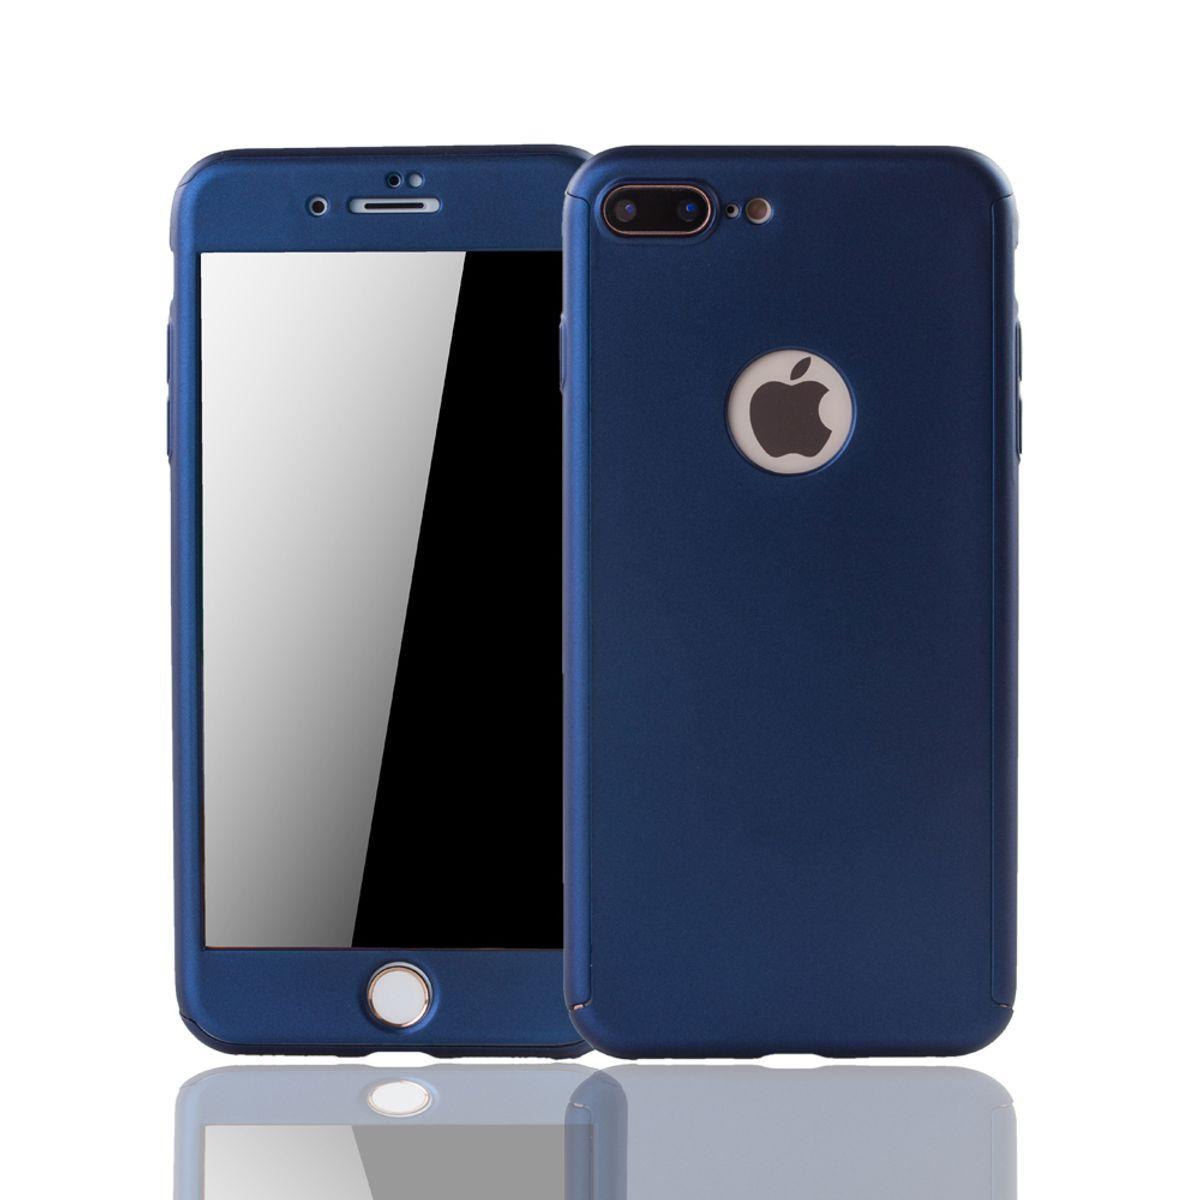 apple iphone 7 plus handy h lle schutz case cover panzer schutz glas blau. Black Bedroom Furniture Sets. Home Design Ideas